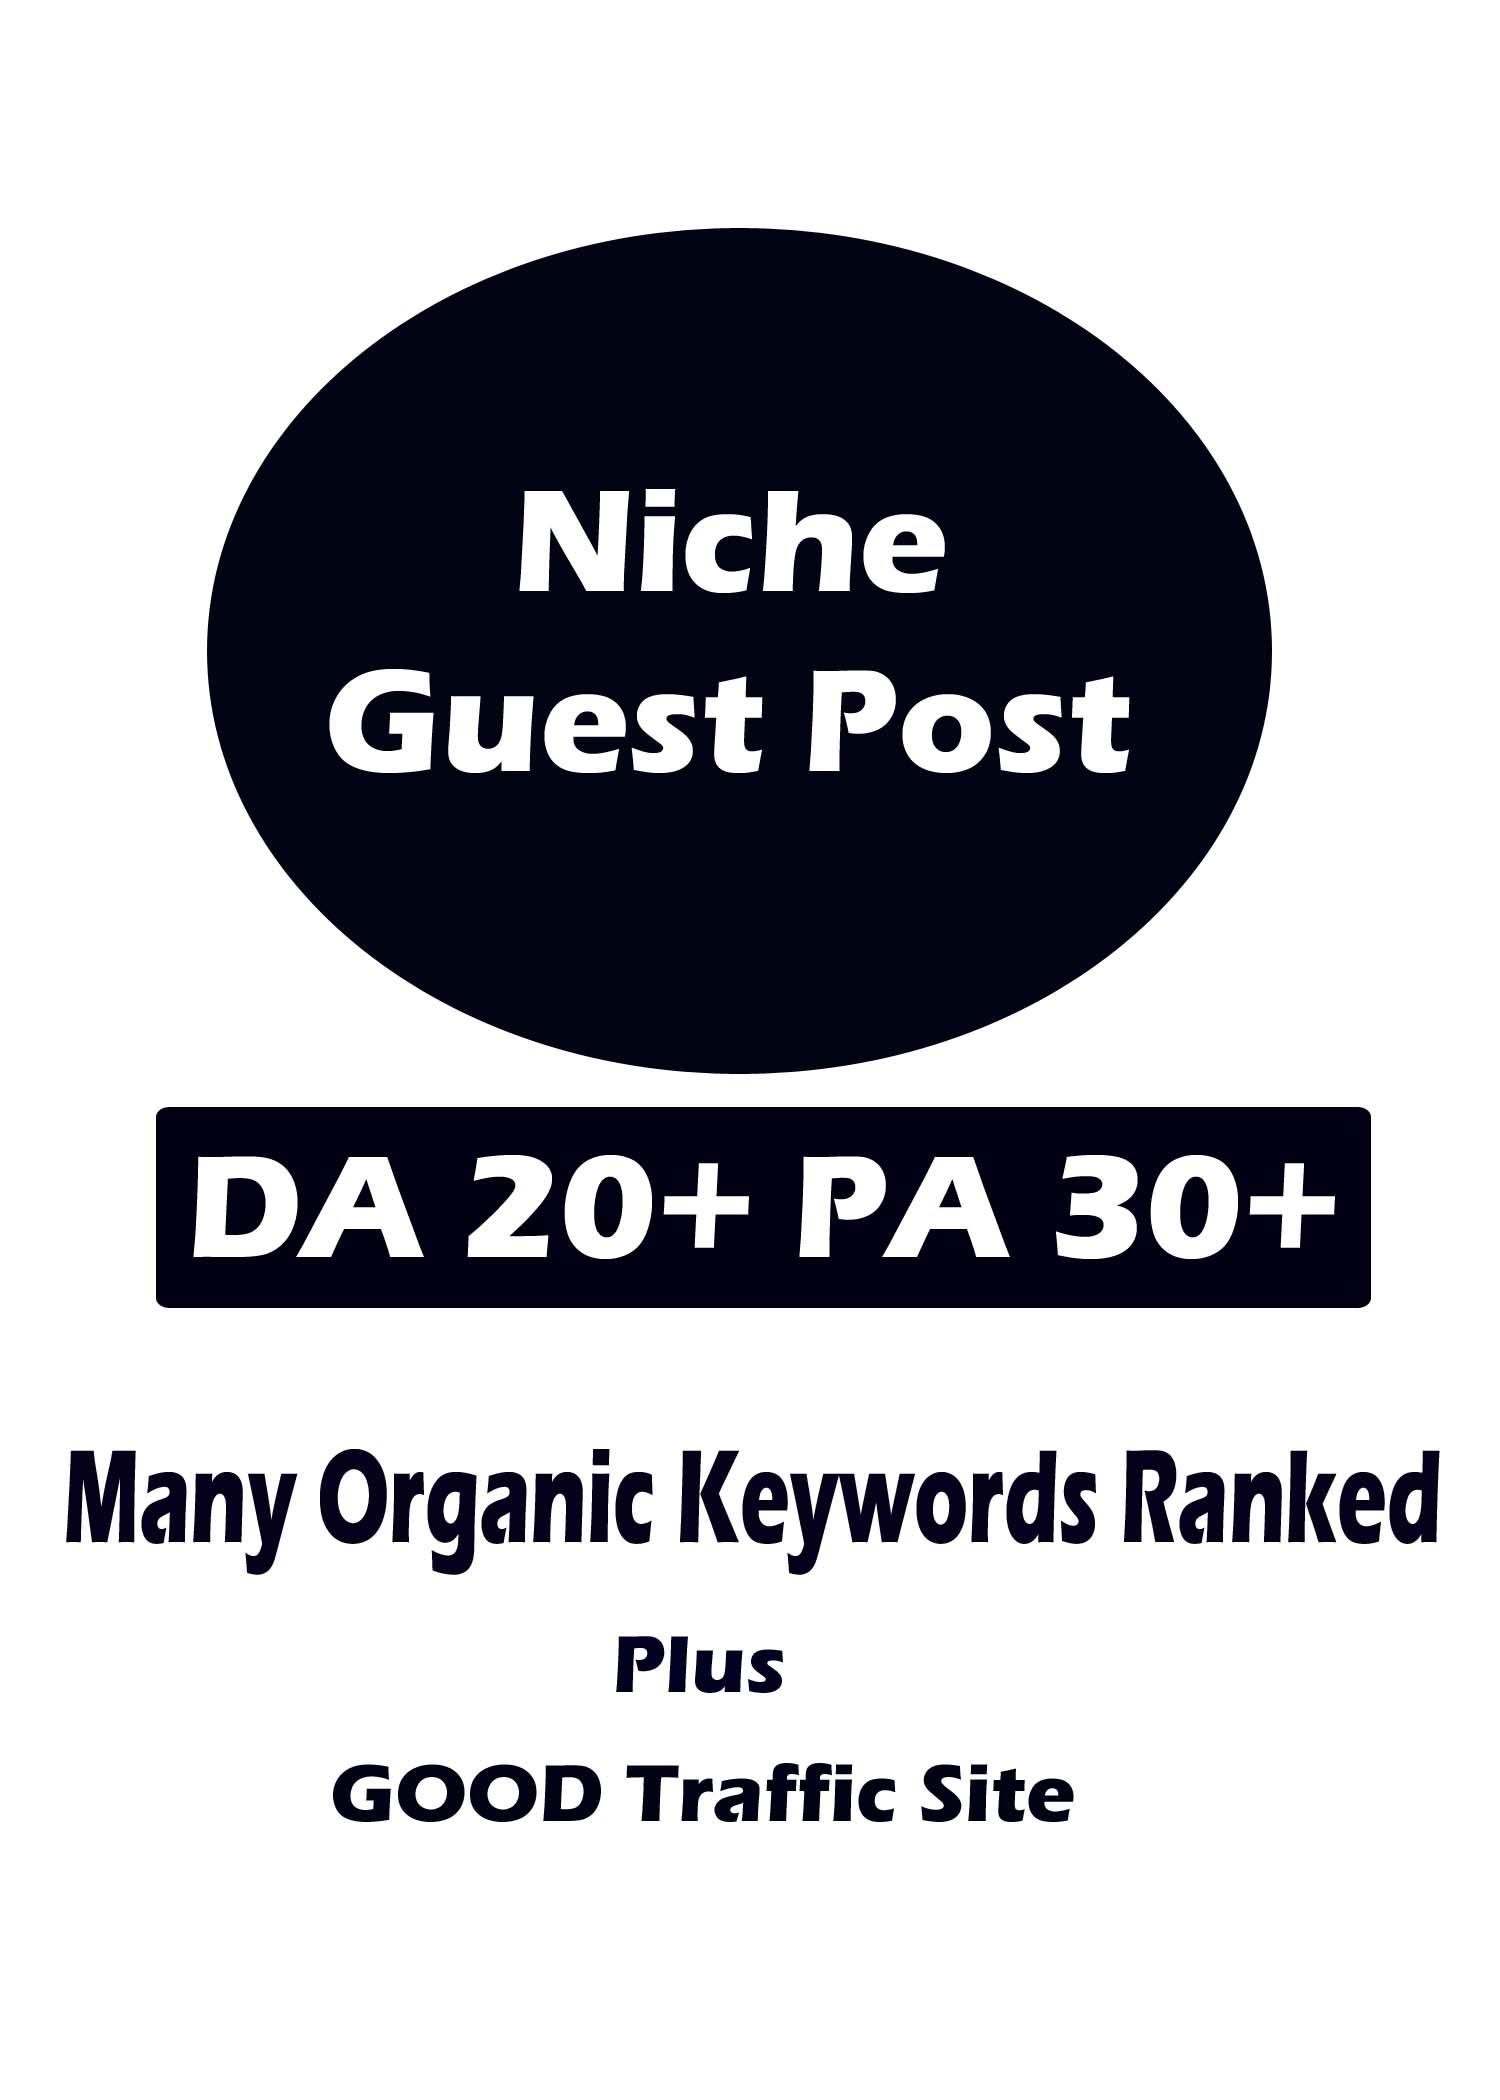 Niche Guest Post on DA 20 plus PA 30 plus sites